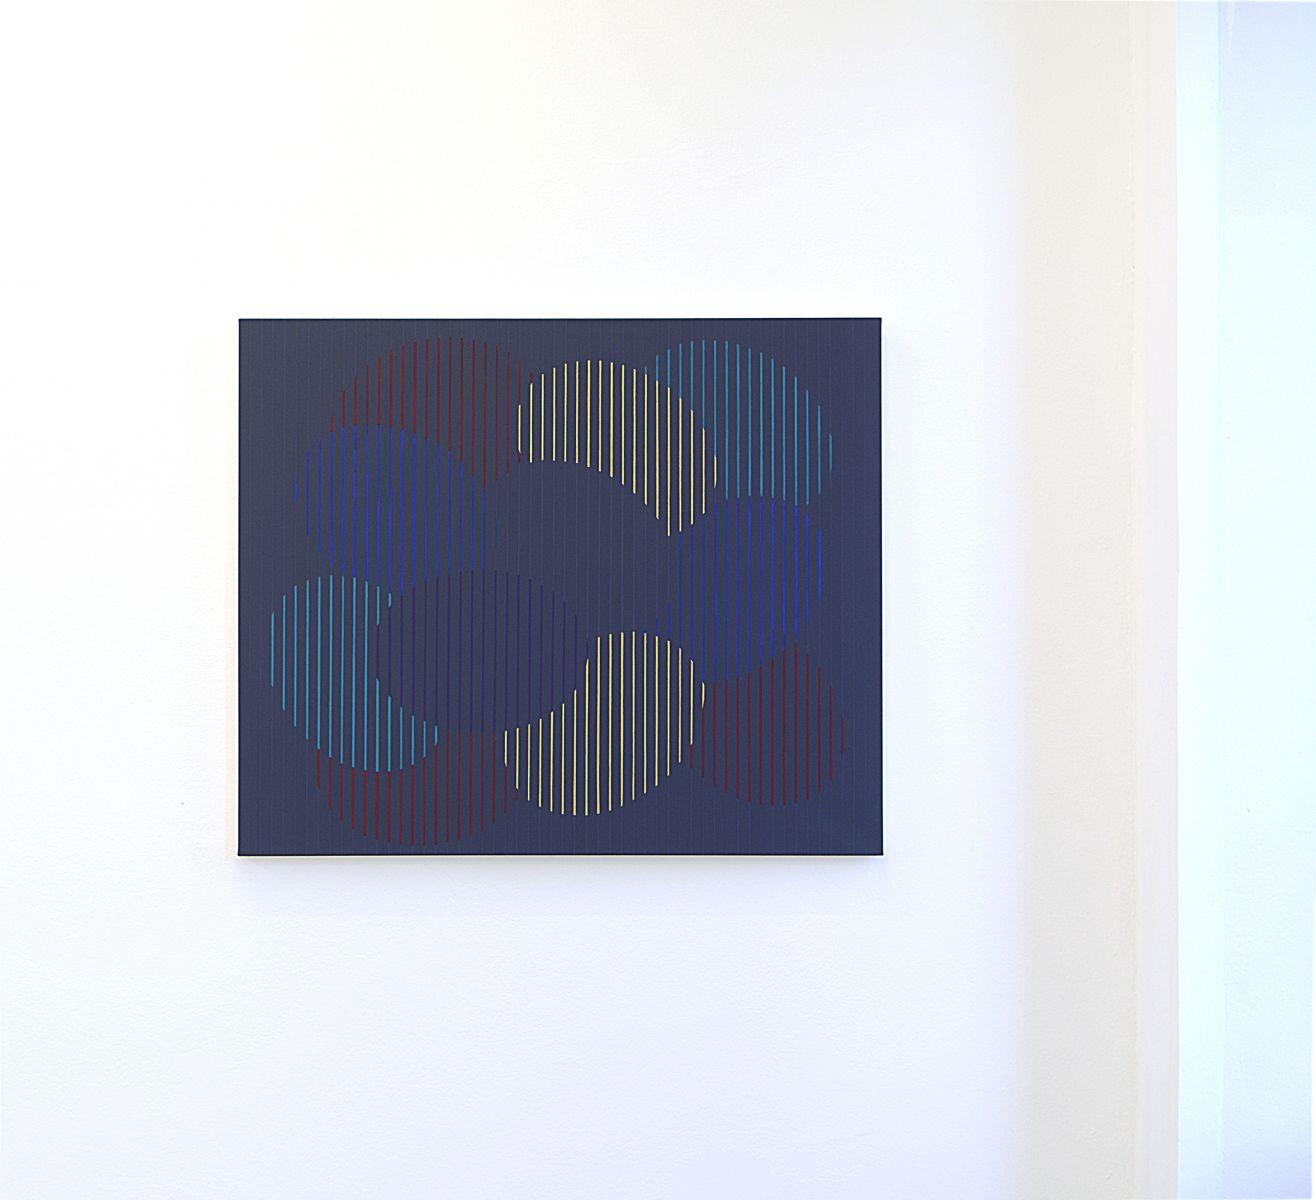 Ovalformation-Christian Eder-artwork-painting